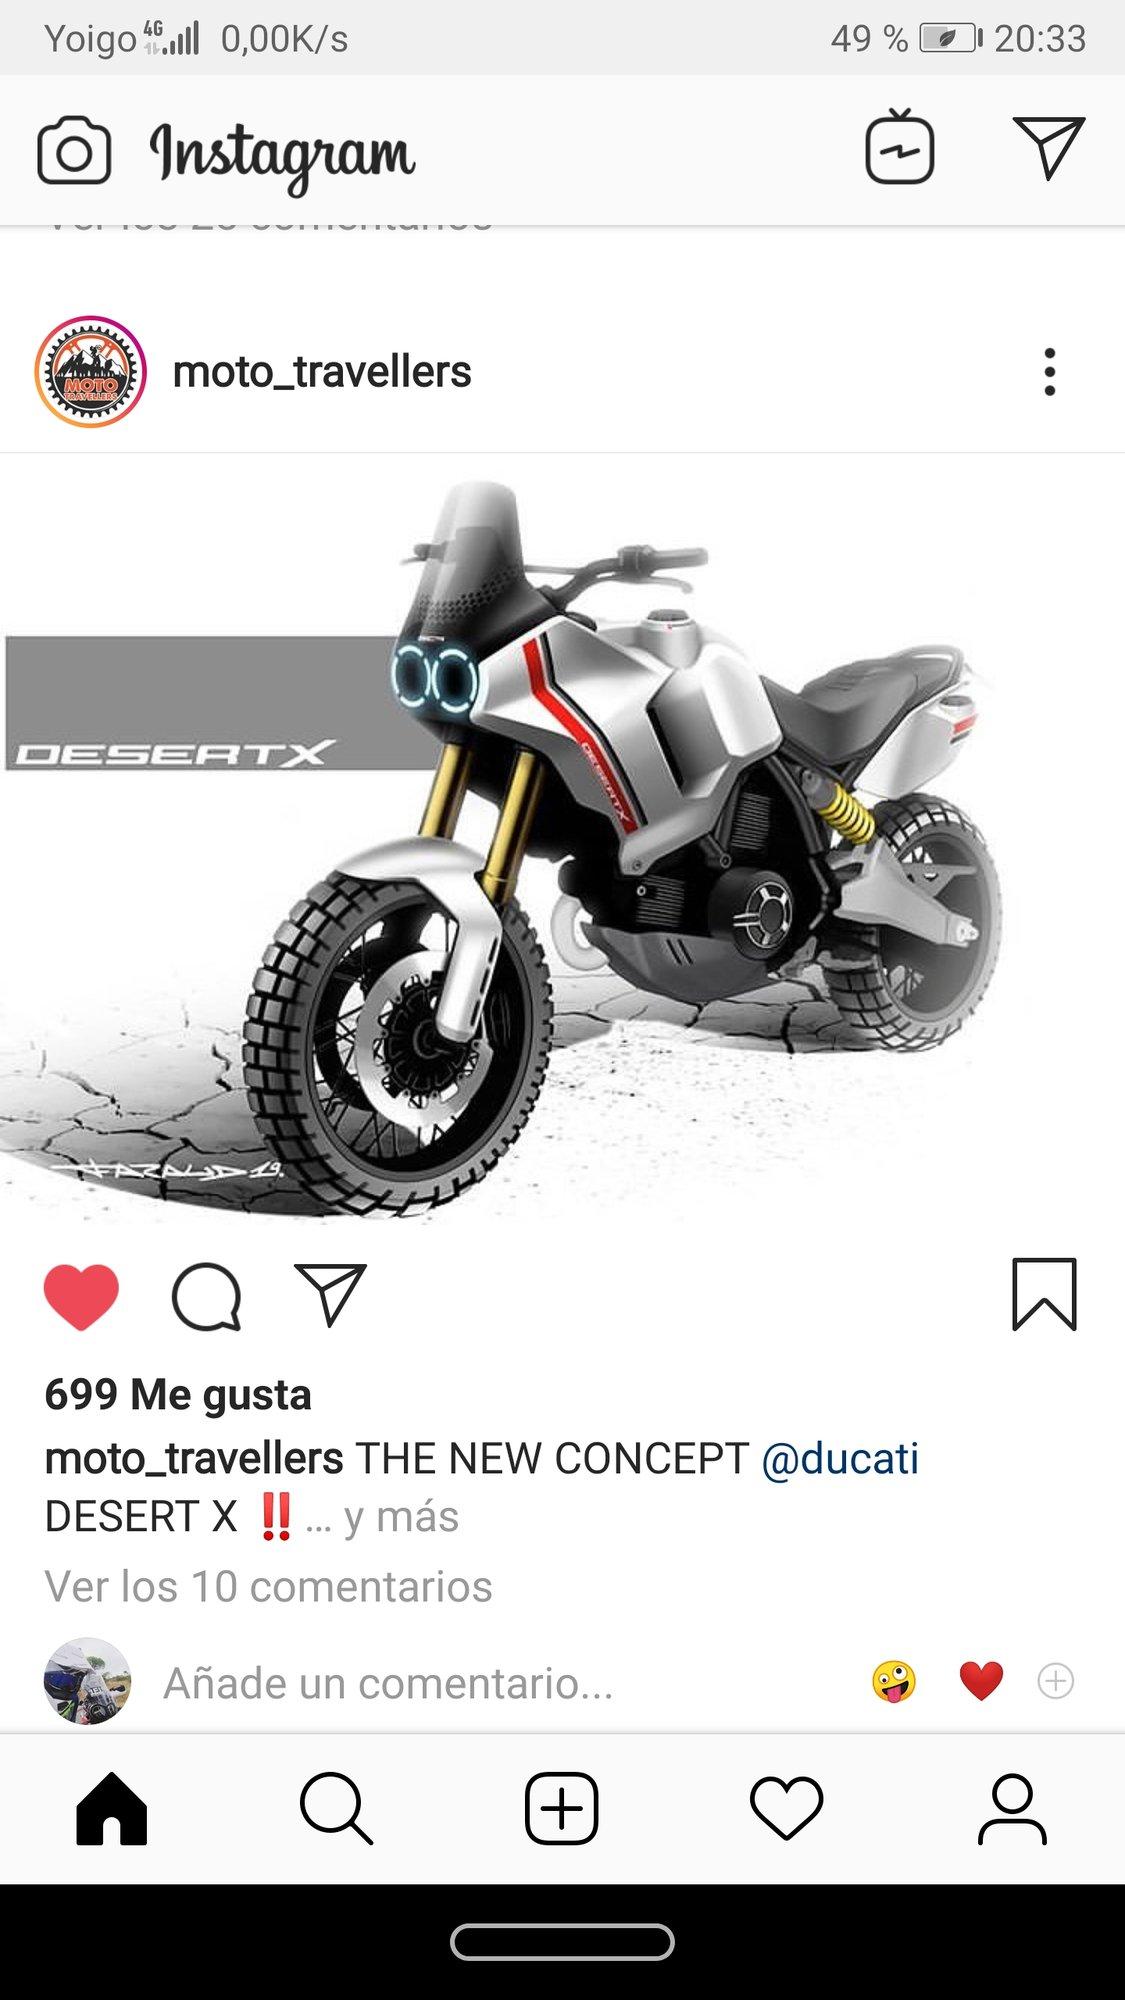 Screenshot_20191031_203319_com.instagram.android.jpg